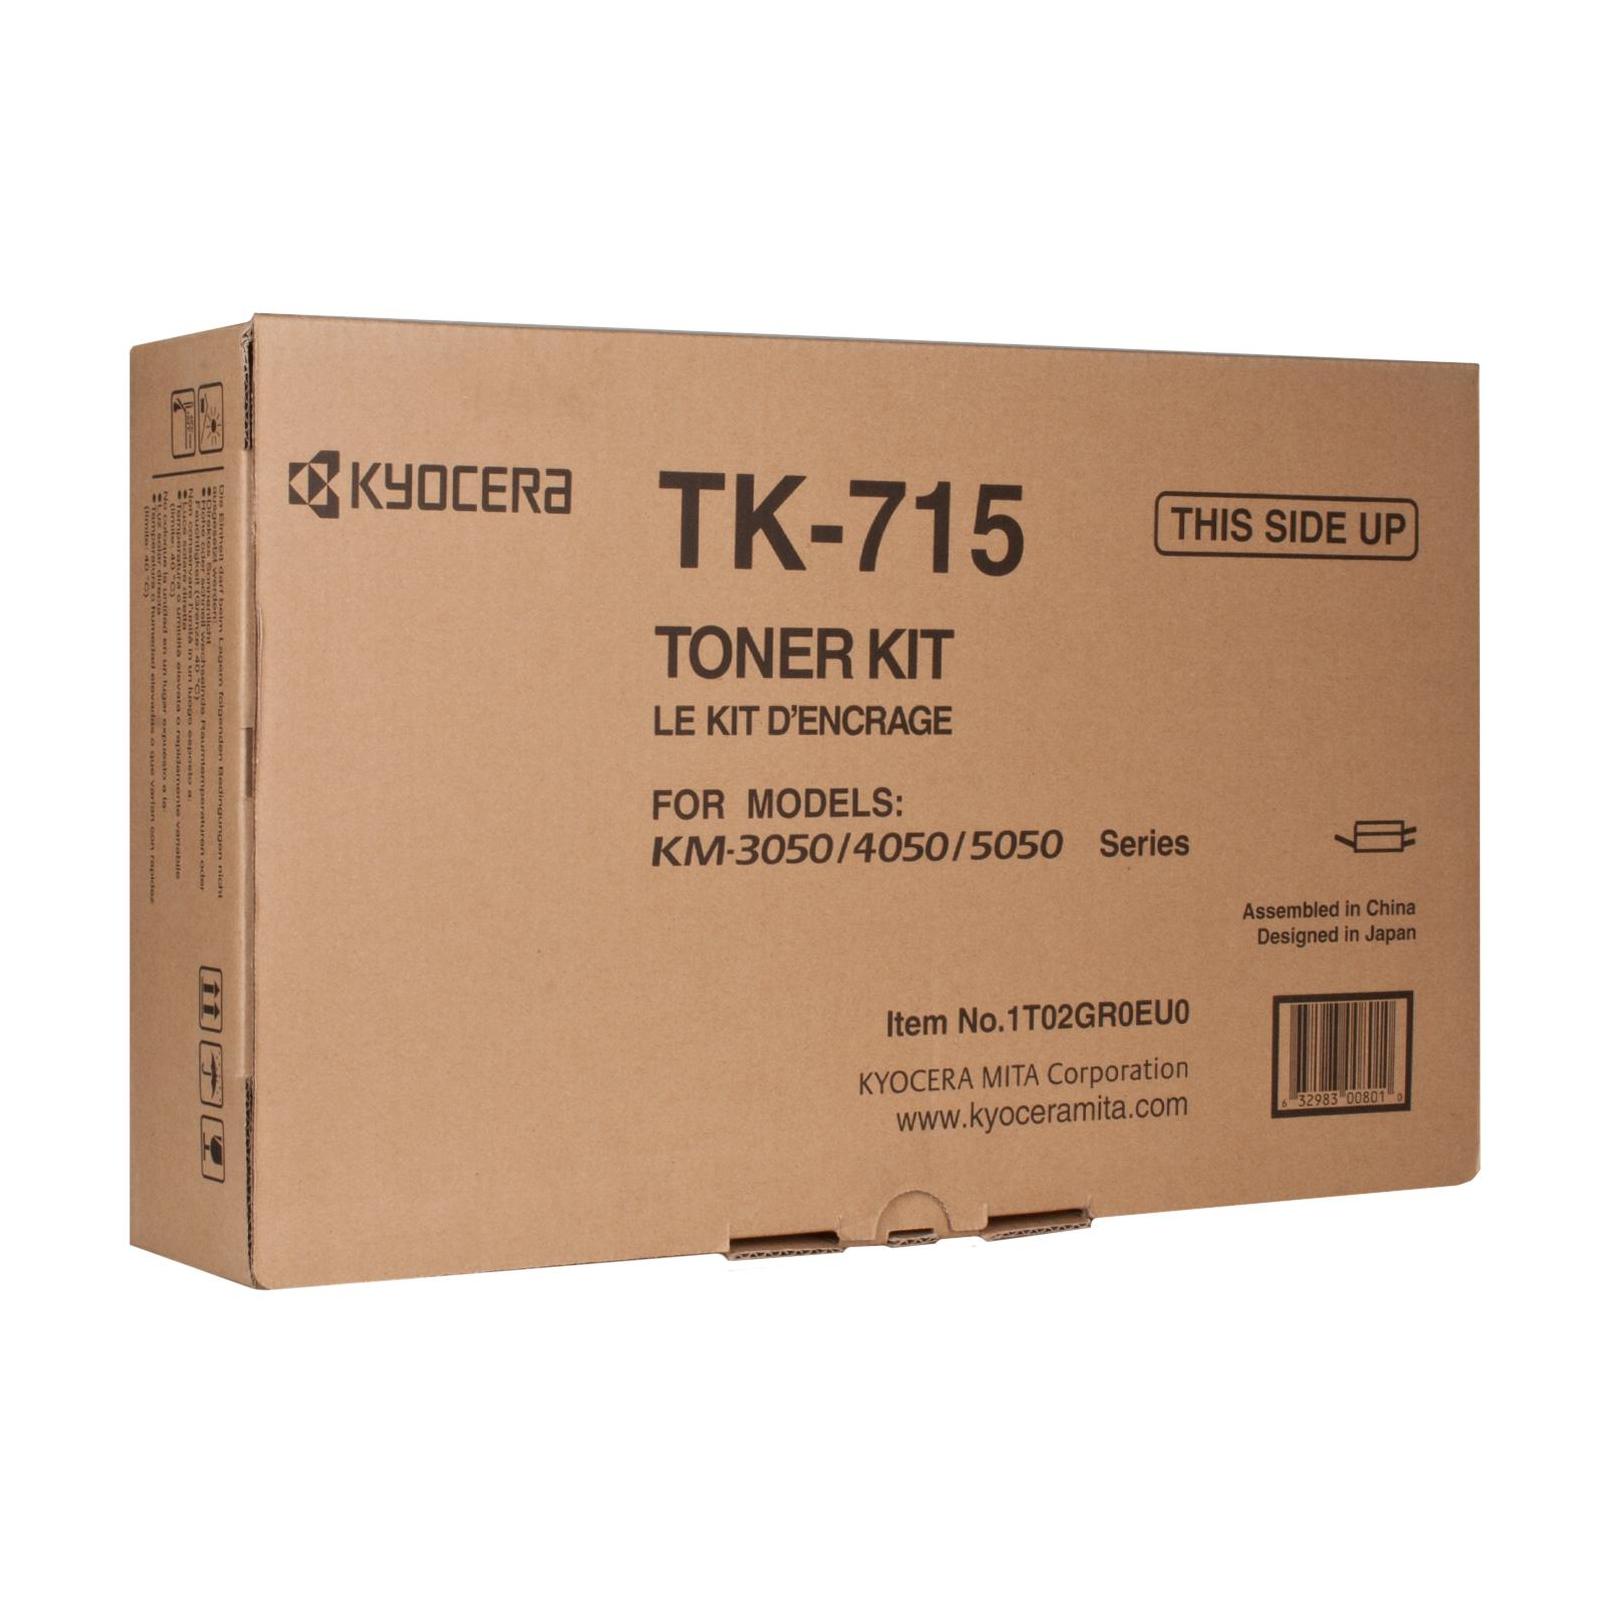 Тонер-картридж Kyocera TK-715 34K (1T02GR0EU0)